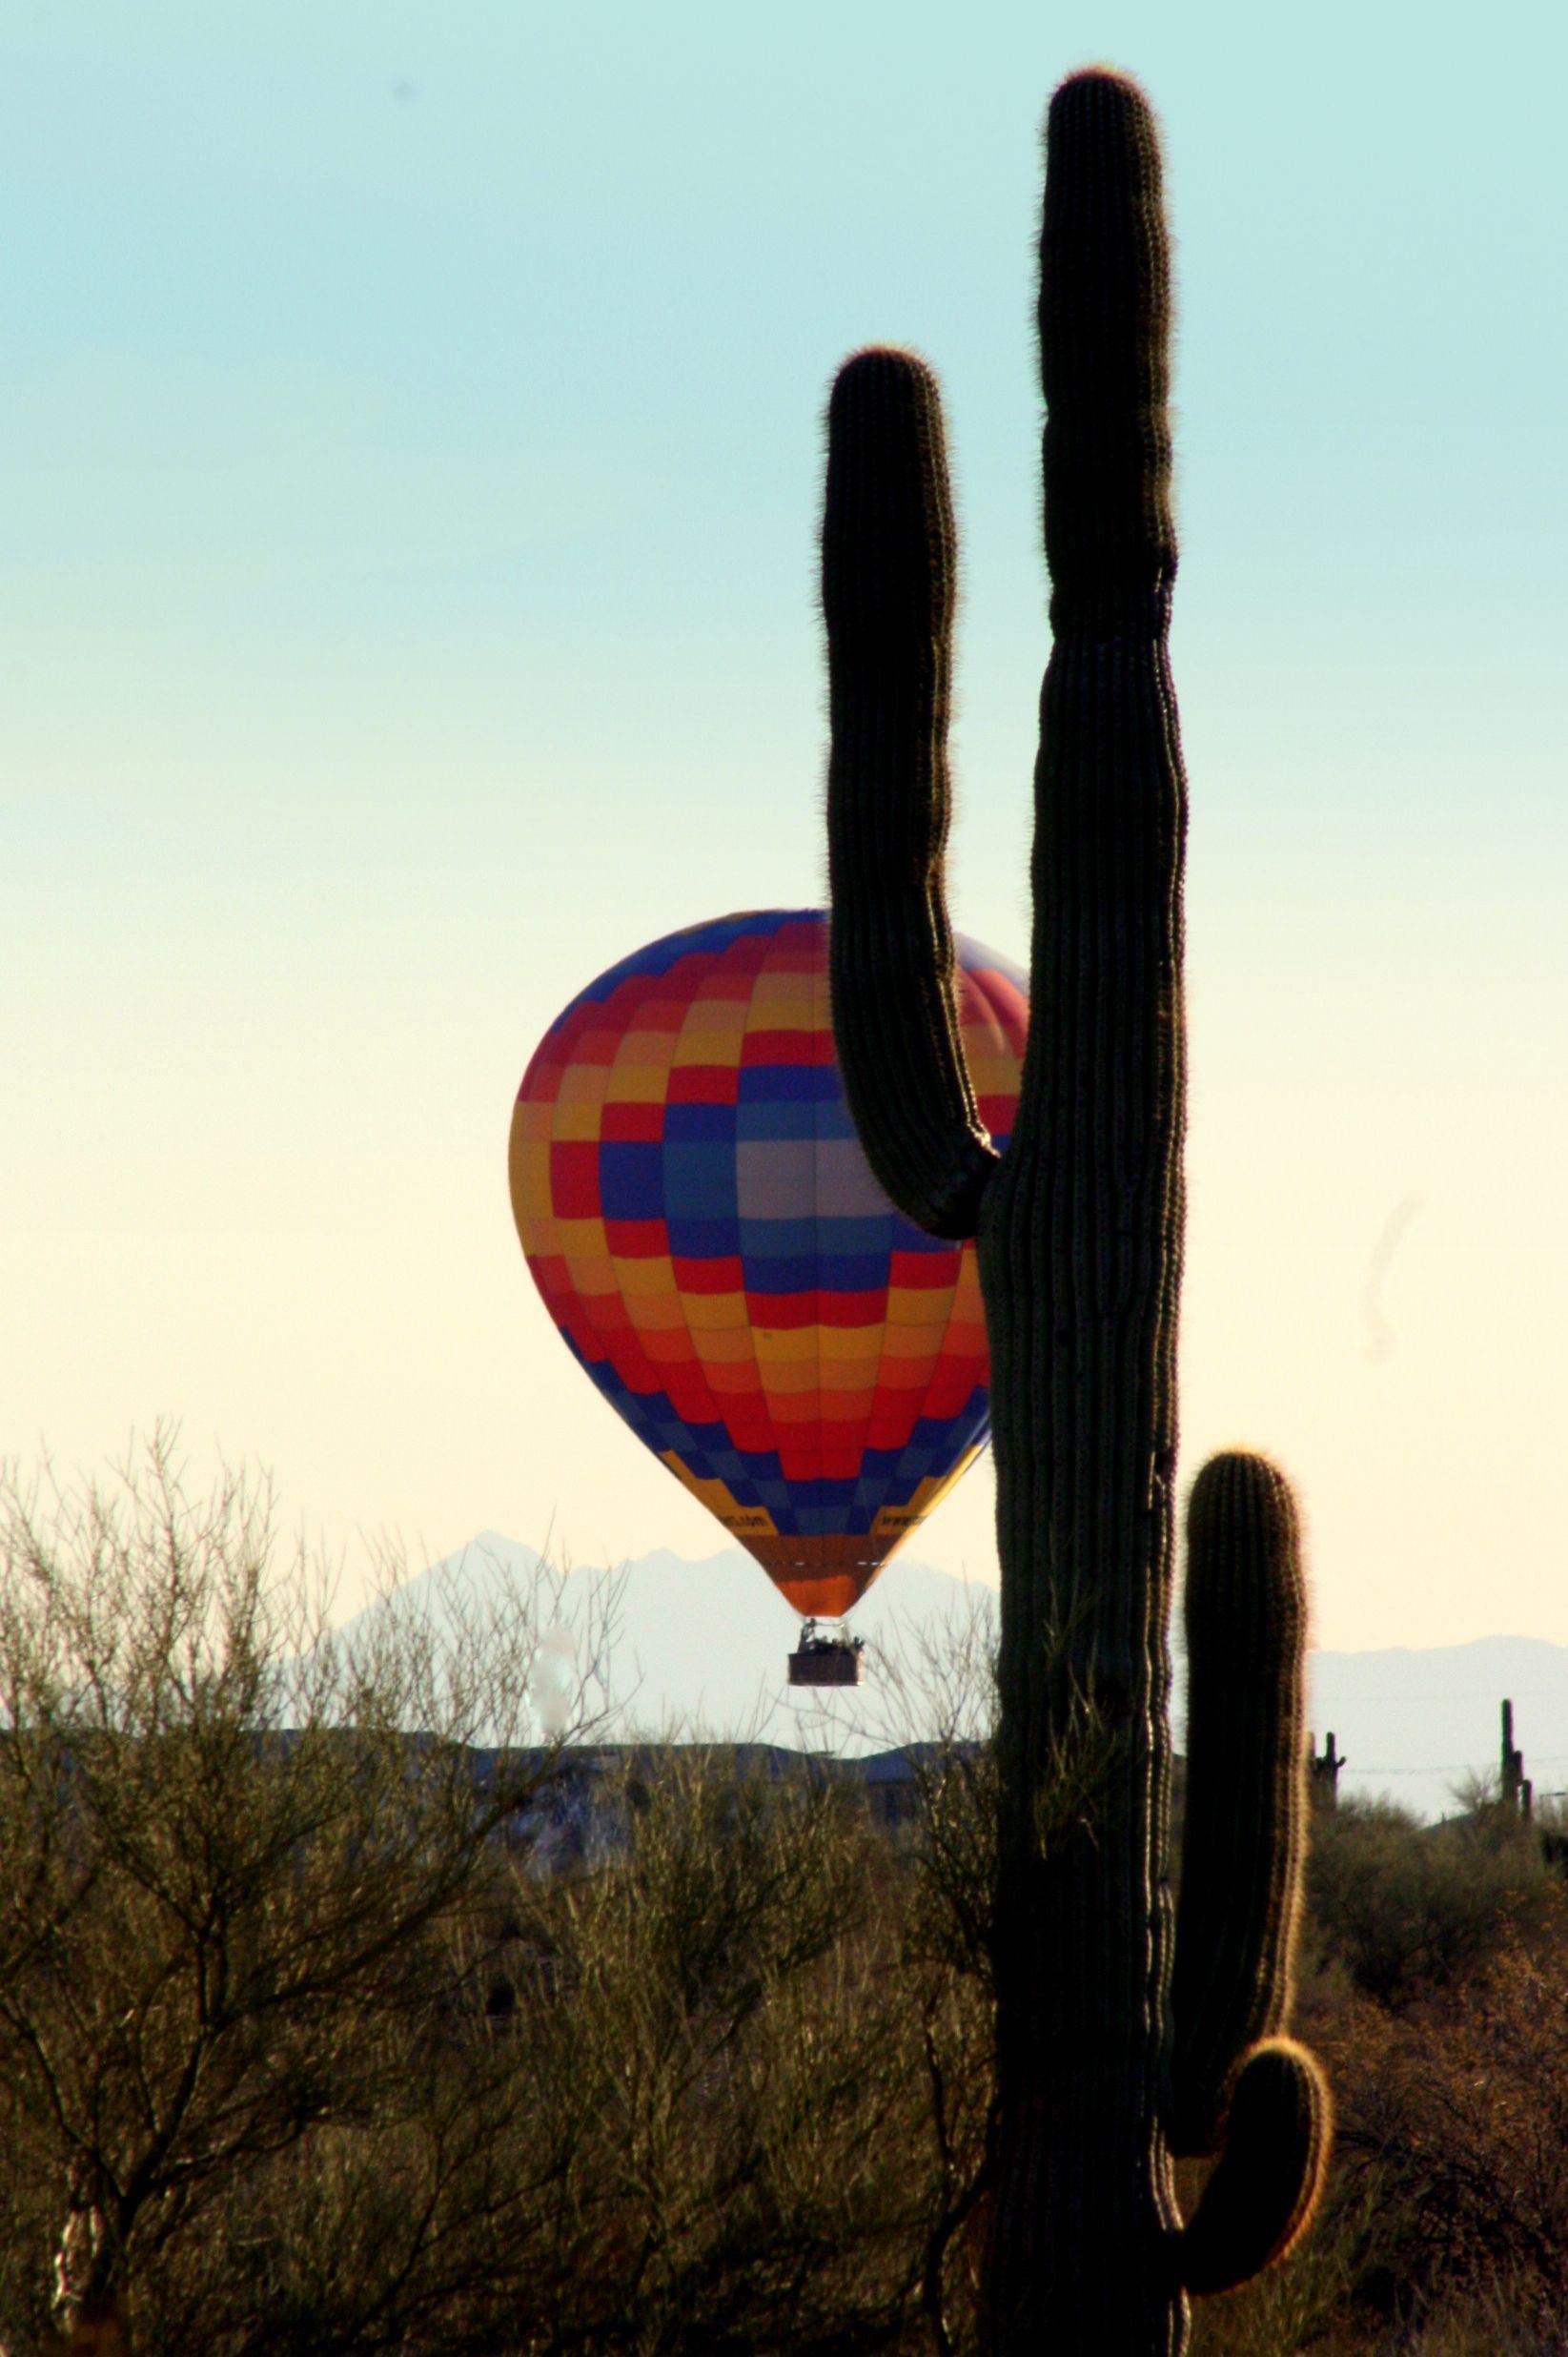 Family Hot Air Balloon Ride. Phoenix, Arizona a gift